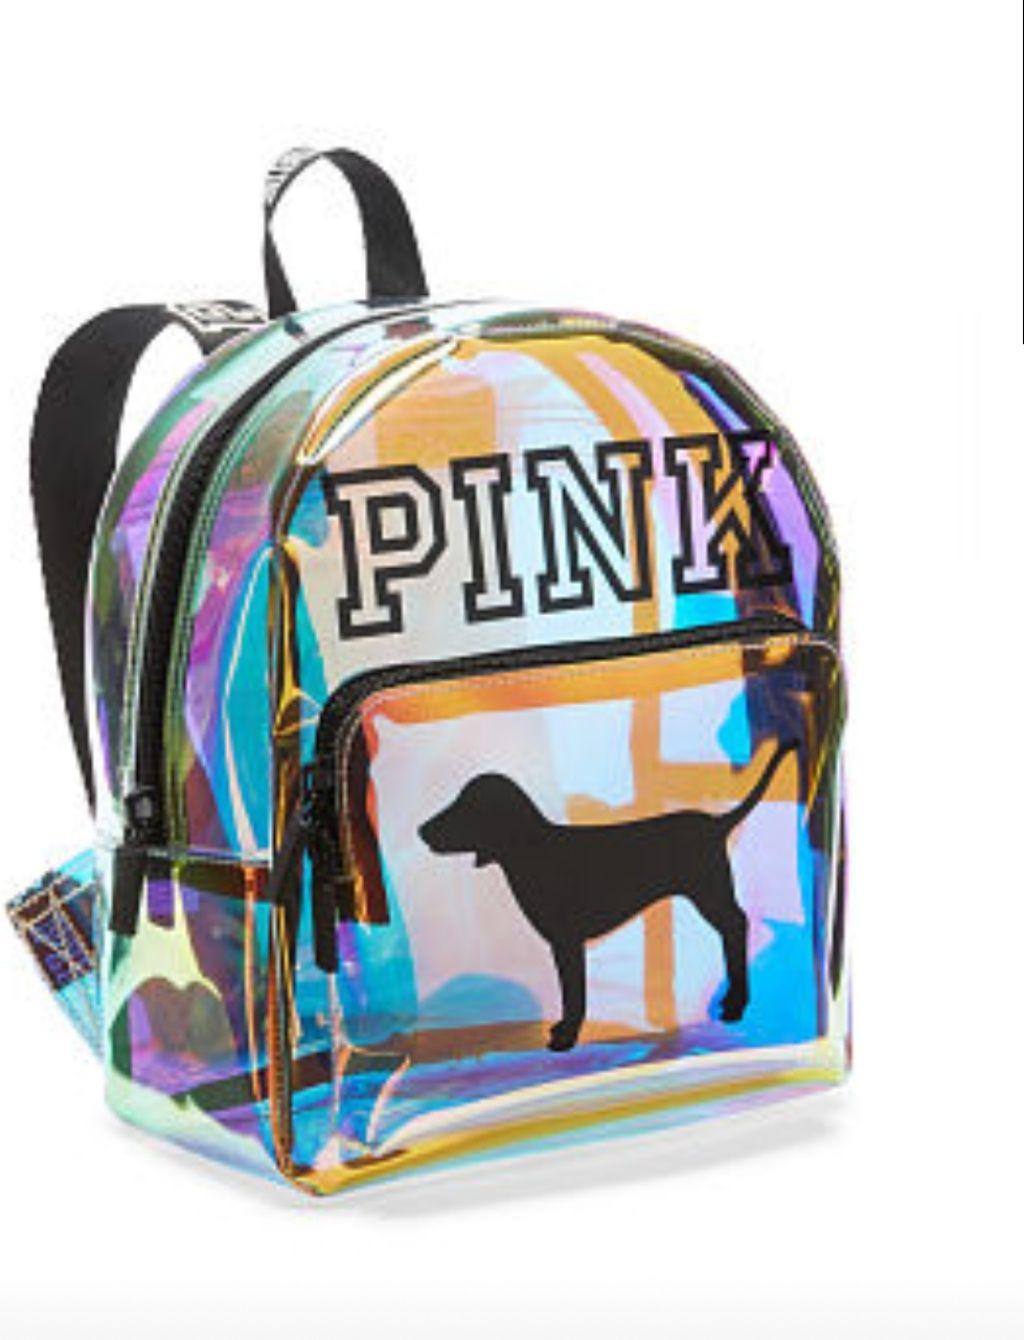 PINK Victoria s Secret Bags  216151adaa45d